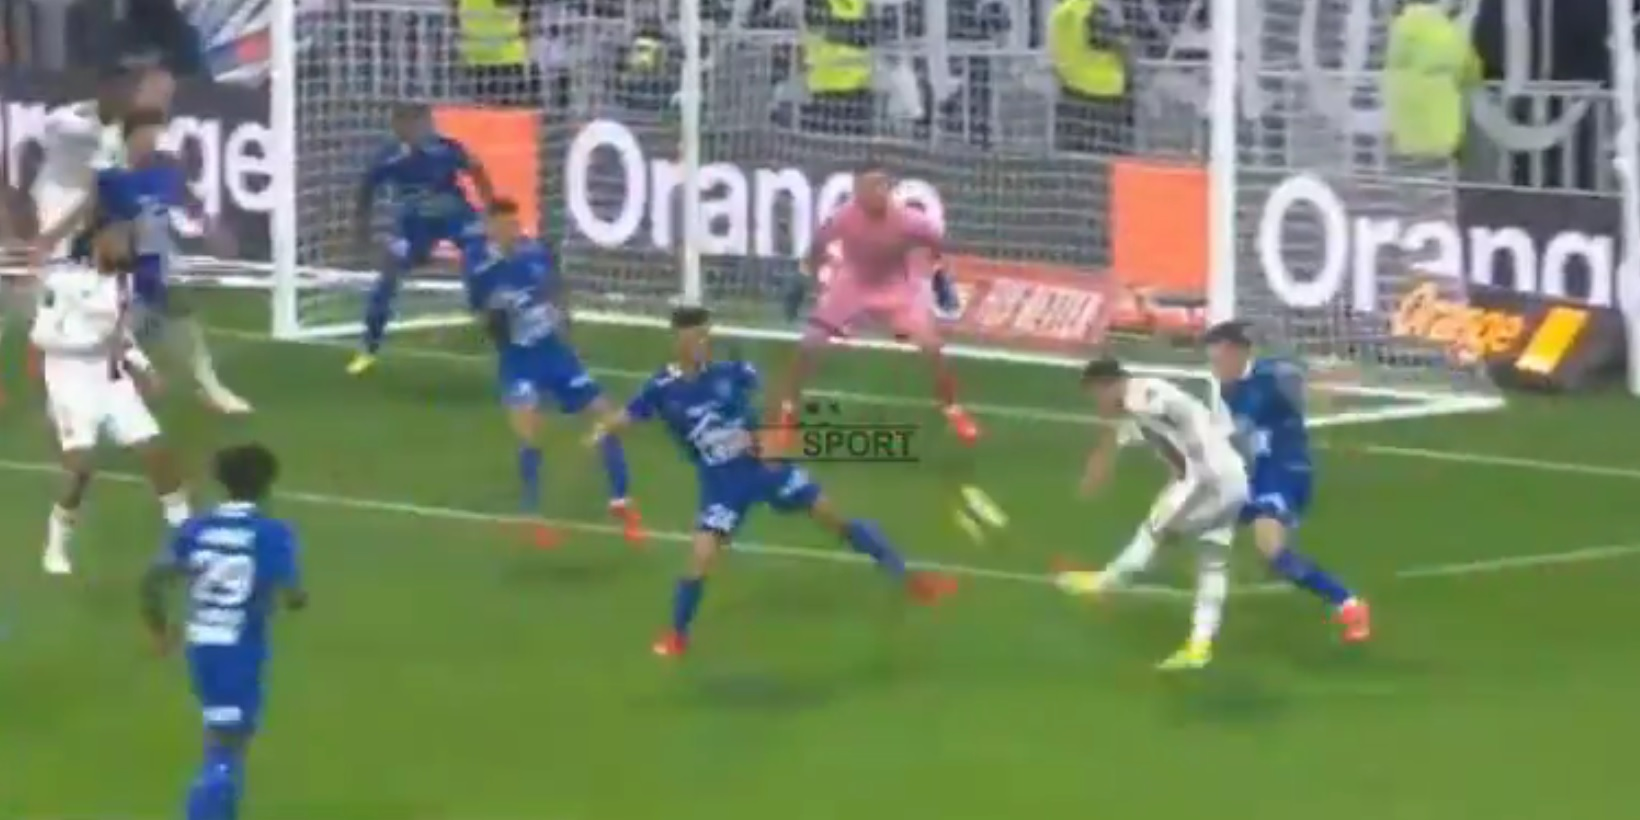 (Video) Former LFC star Xherdan Shaqiri scores brilliant first goal for Lyon